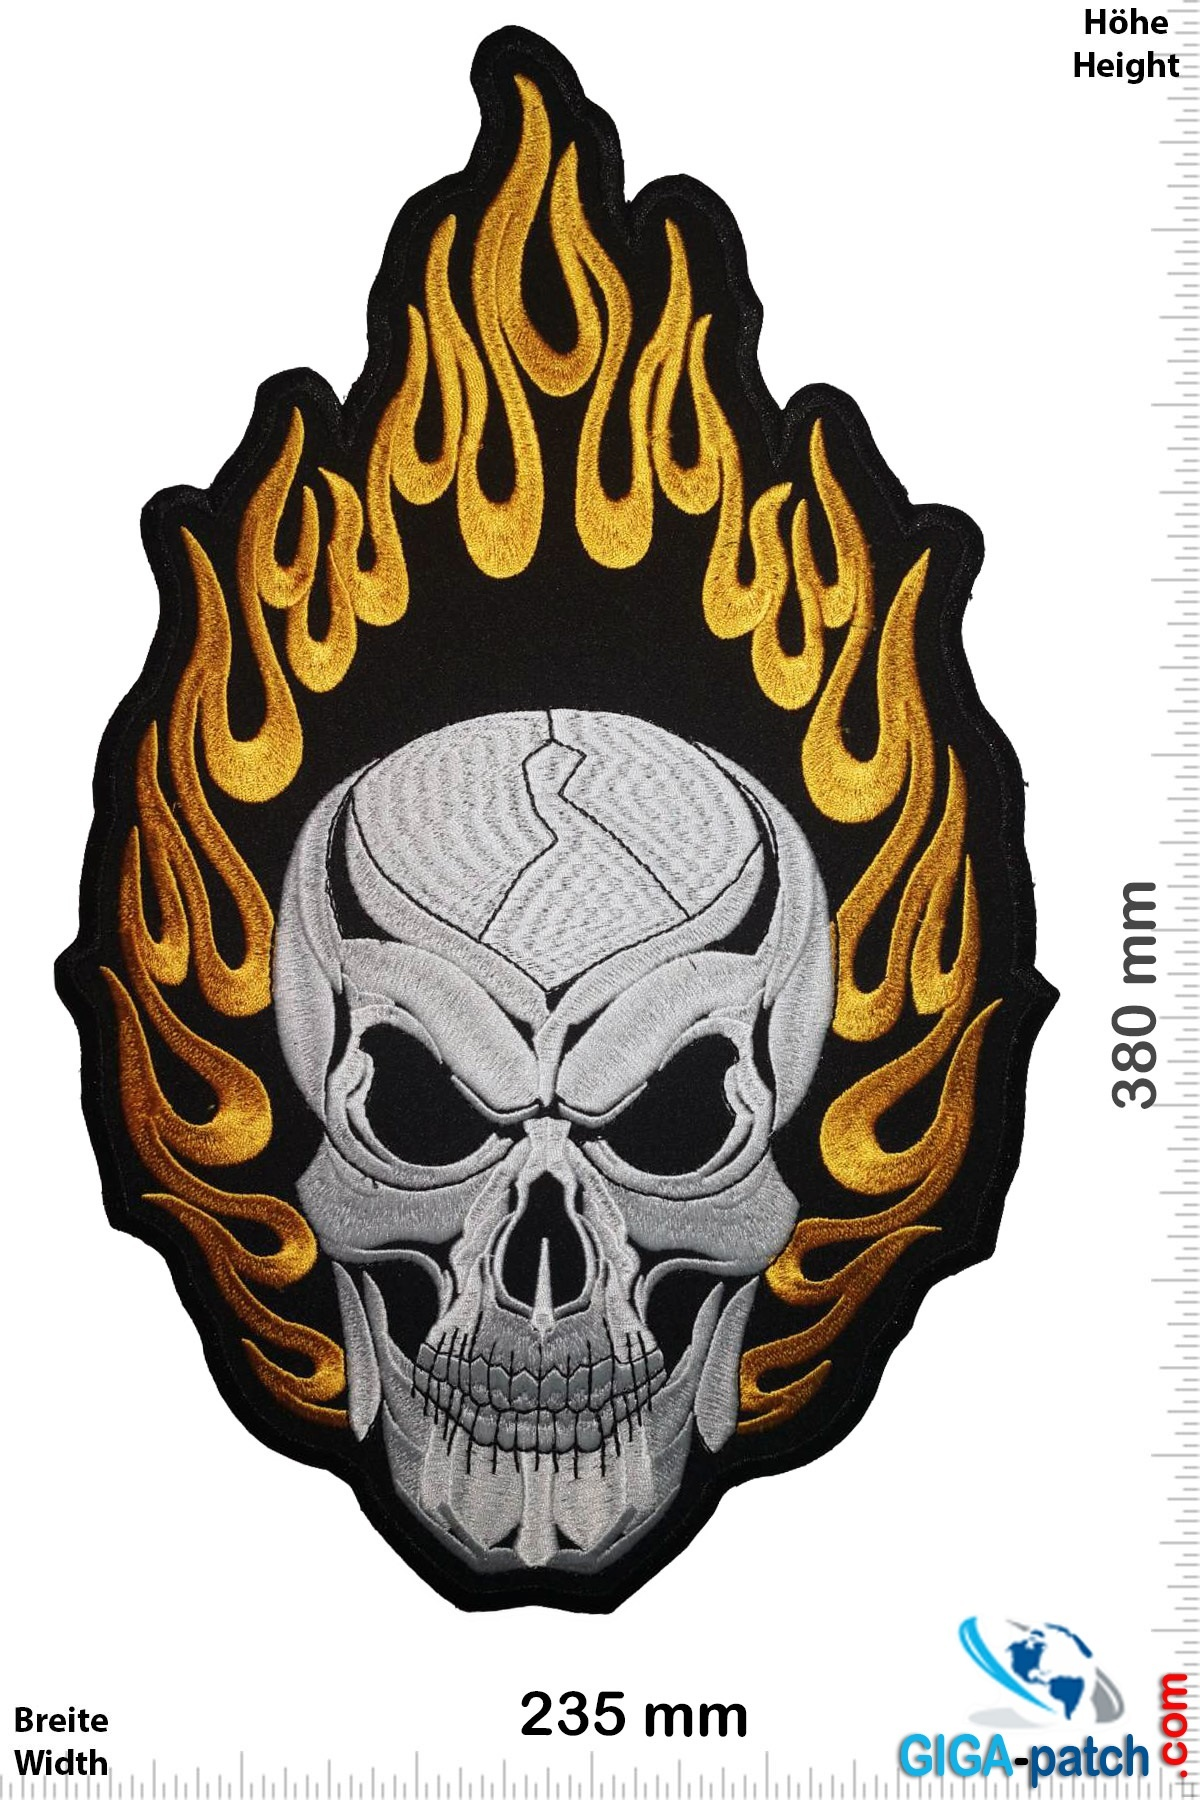 Suzuki Skull Aufkleber Skull Sticker Totenkopf Aufkleber Suzuki Sports,,,